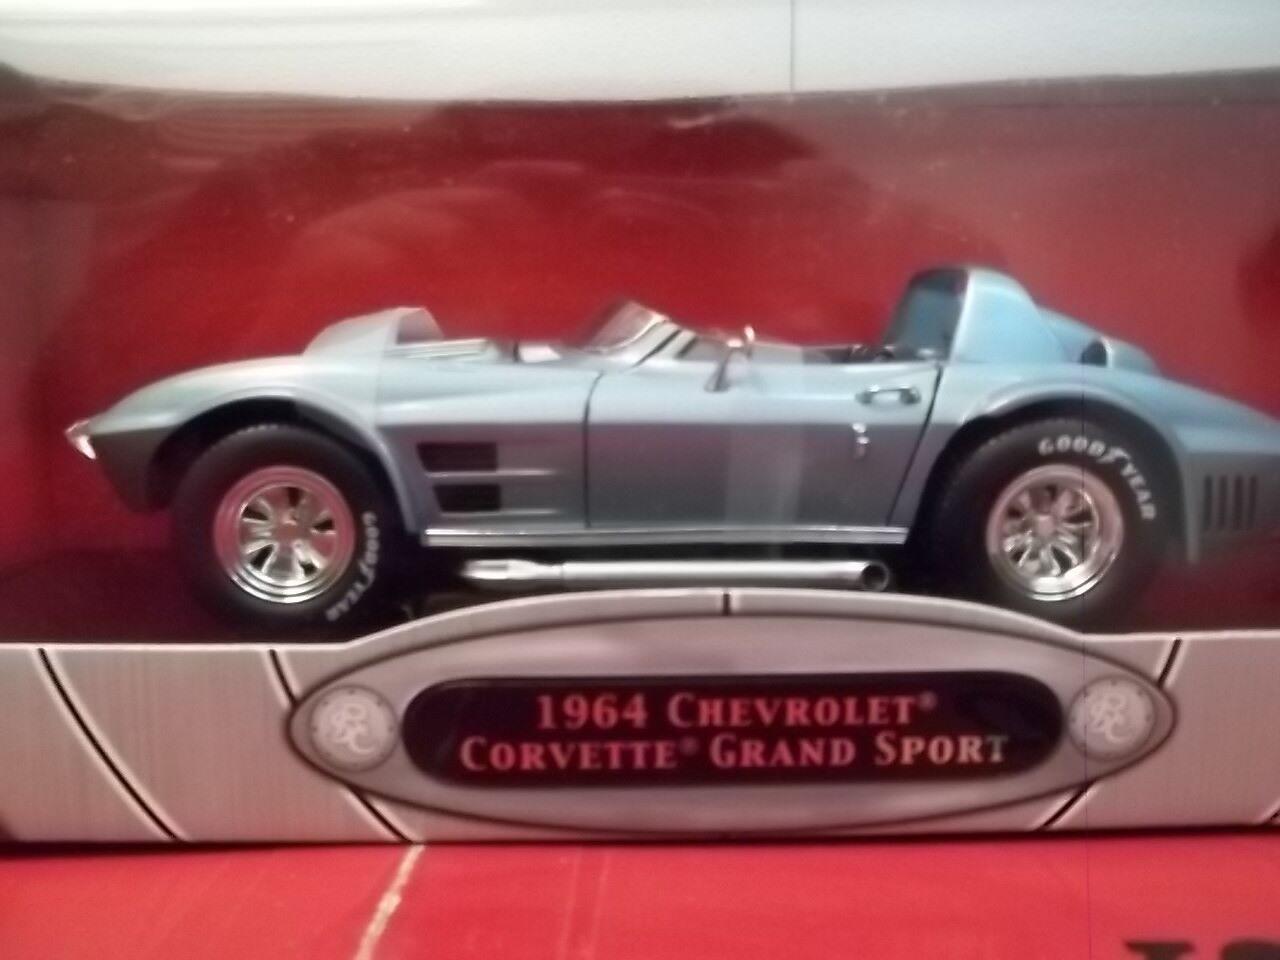 1964 Chevrolet Corvette Grand Sport bluee 1 18 Road Legends YatMing